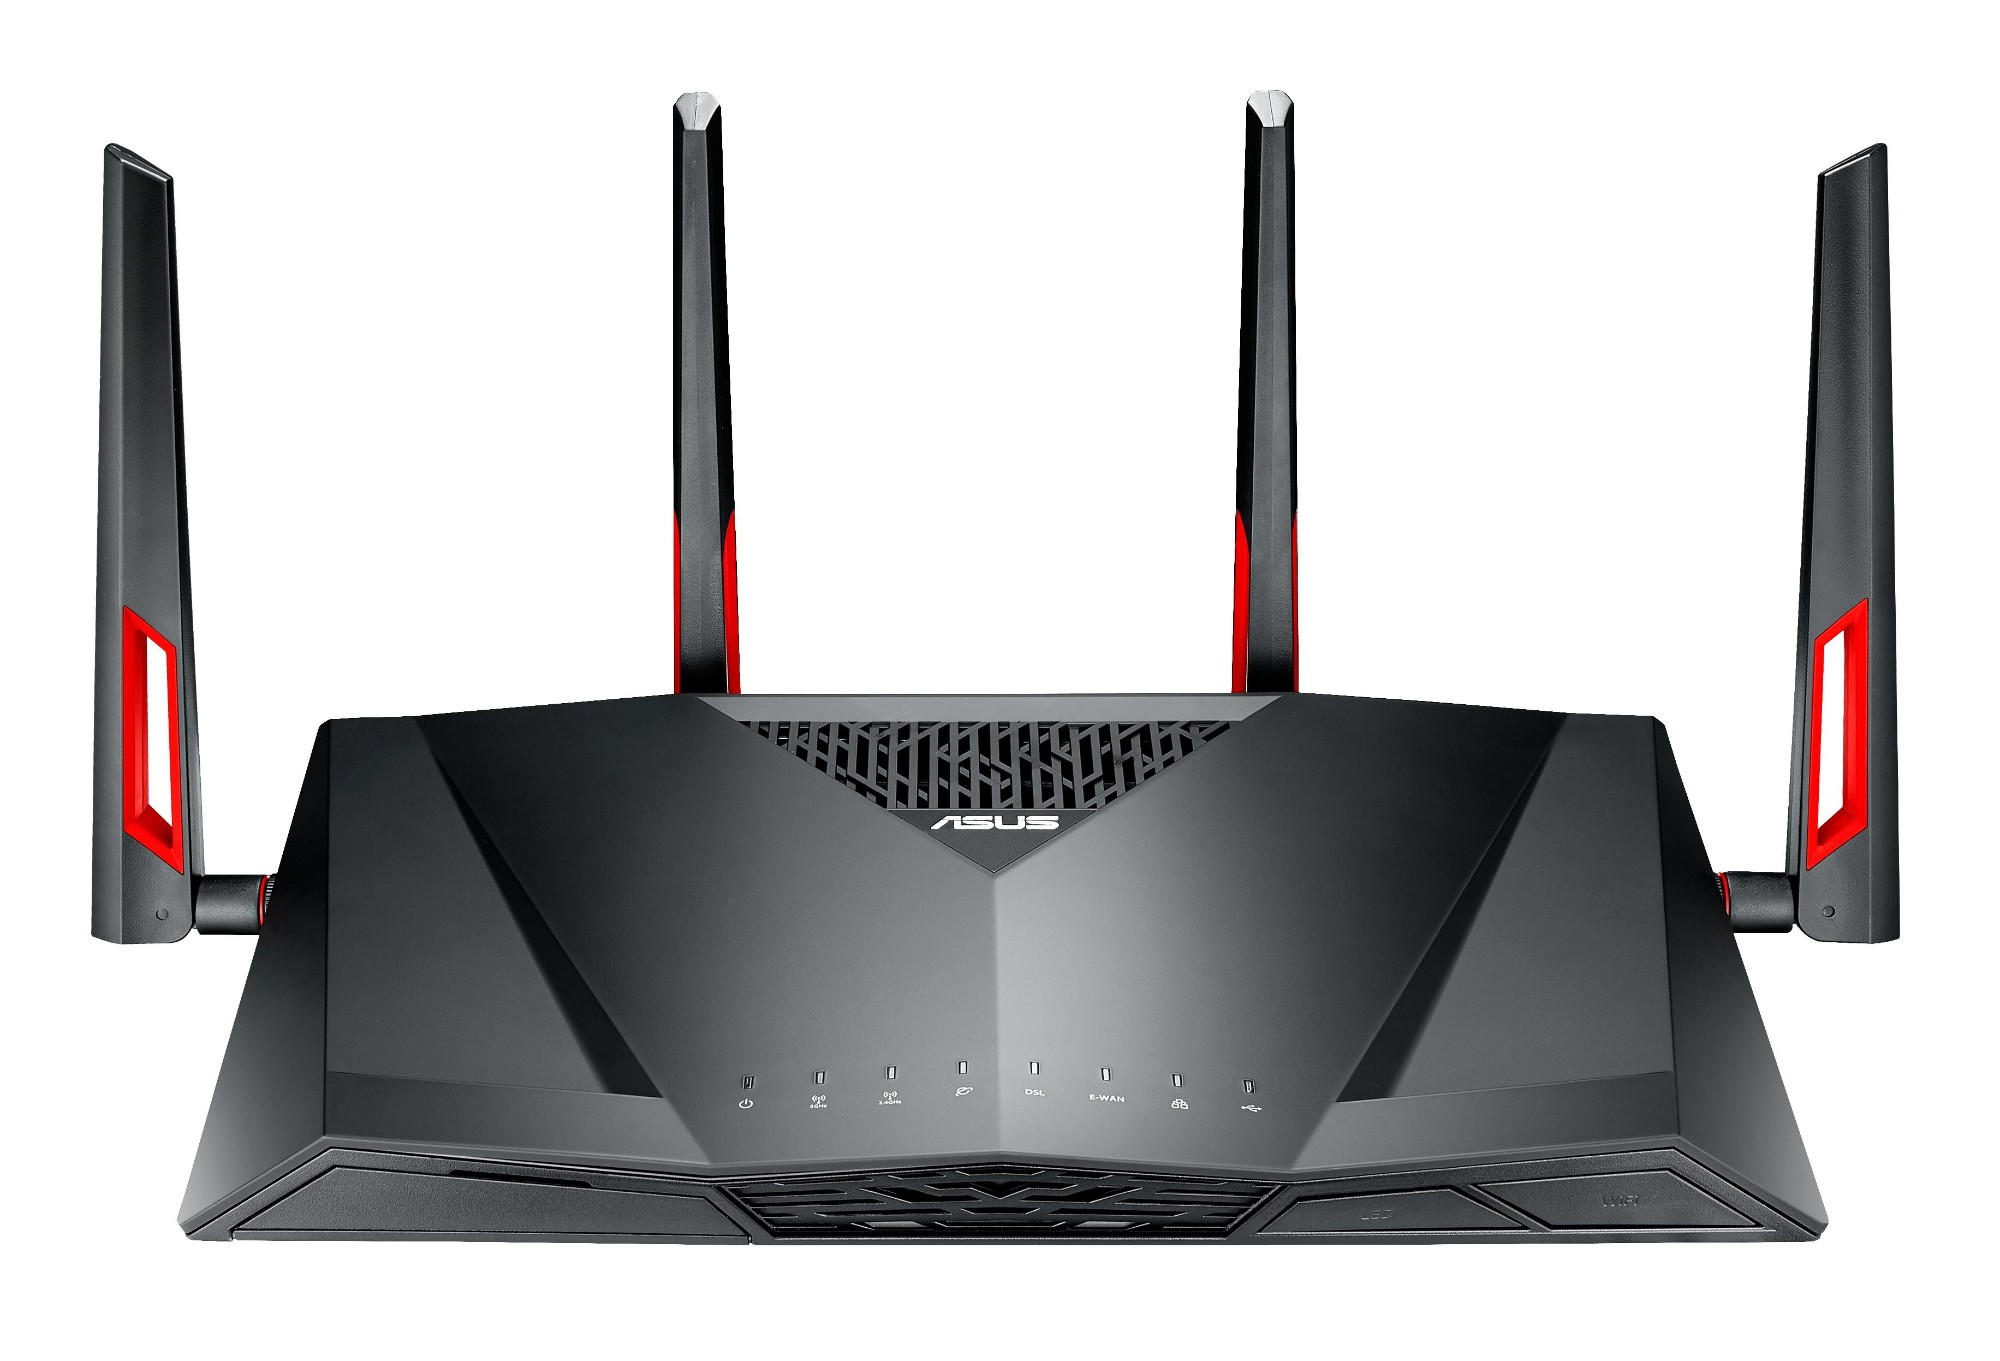 ASUS DSL-AC88U Dual-band (2.4 GHz / 5 GHz) Gigabit Ethernet Black wireless router